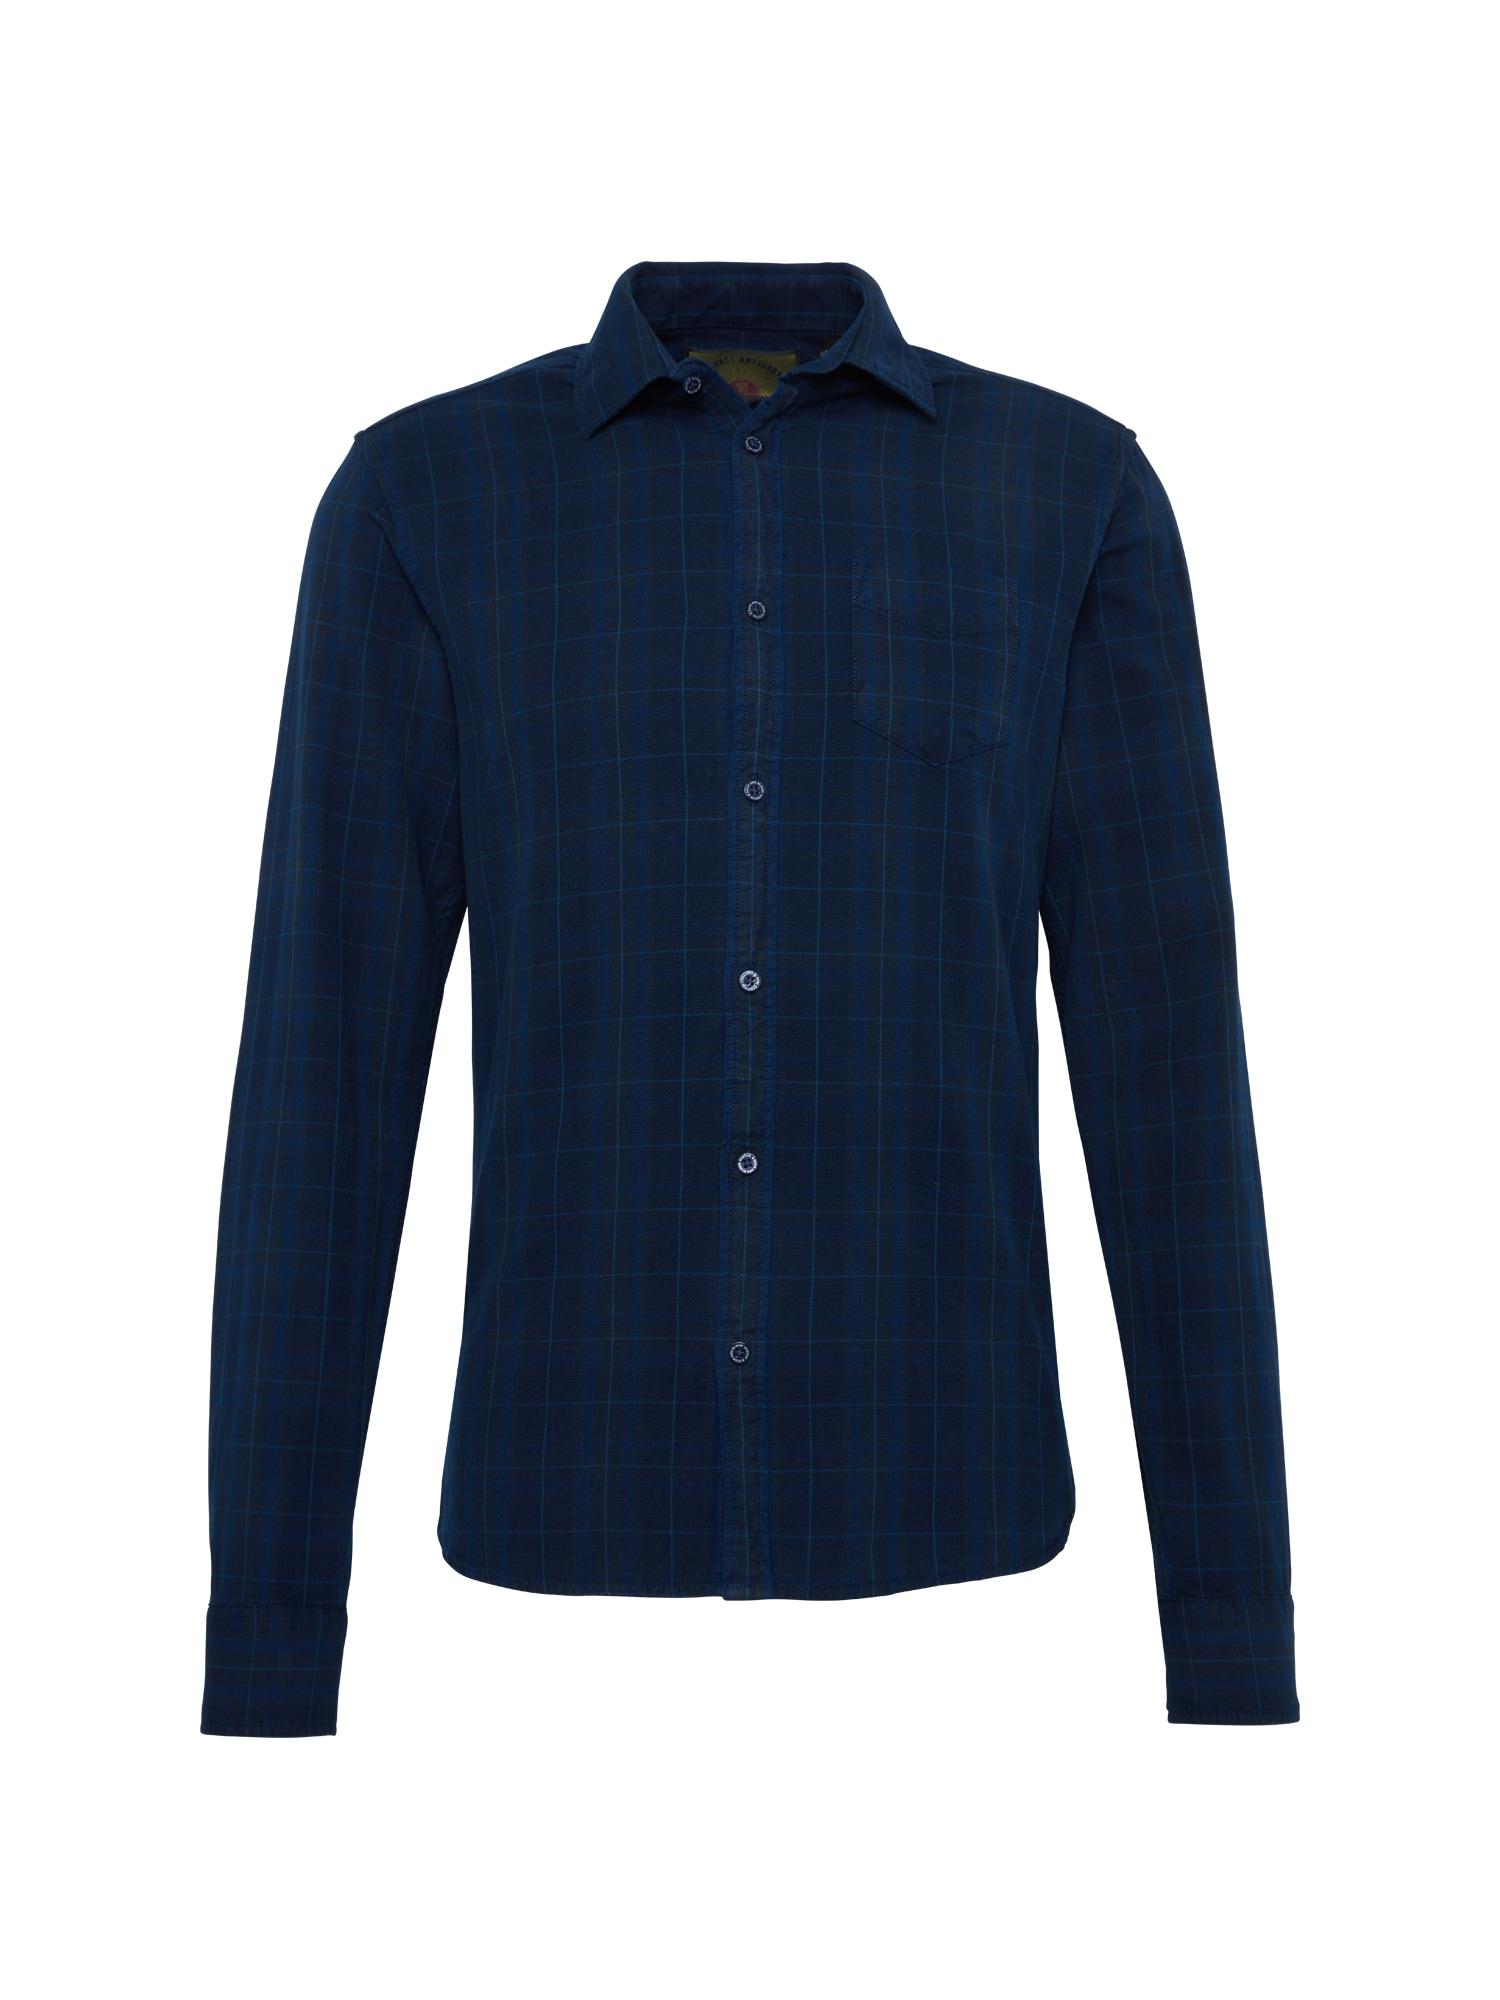 SCOTCH  and  SODA Heren Overhemd Ams blauw slim fit indigo oxford check shirt do